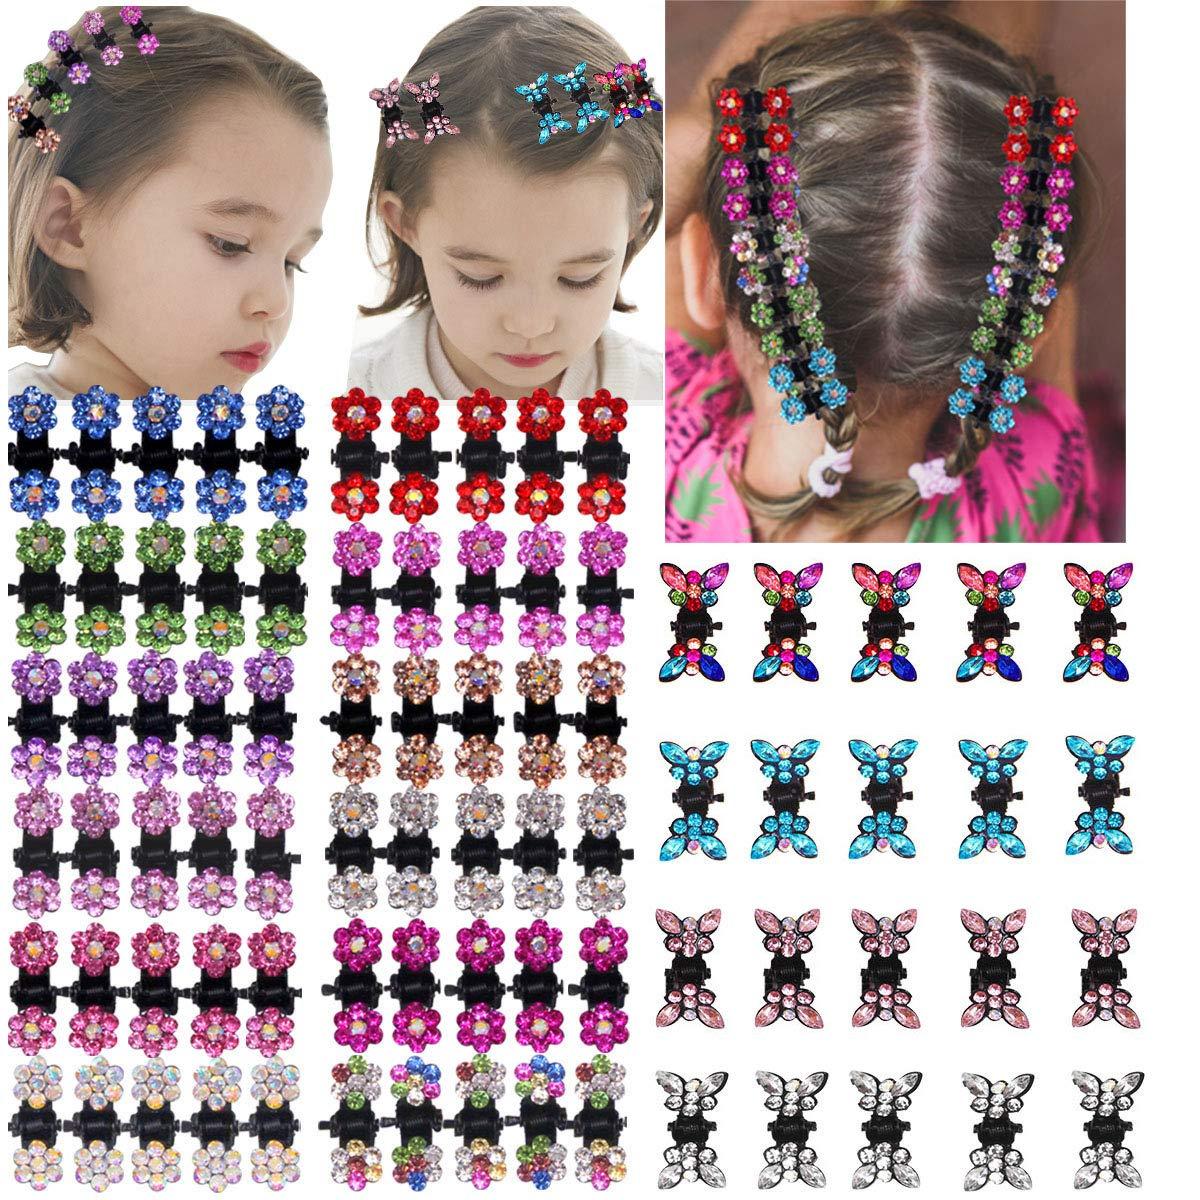 100% quality warranty DeD 80pcs Flower Rhinestone Hair Clips Al sold out. Glitter H Clip Bangs